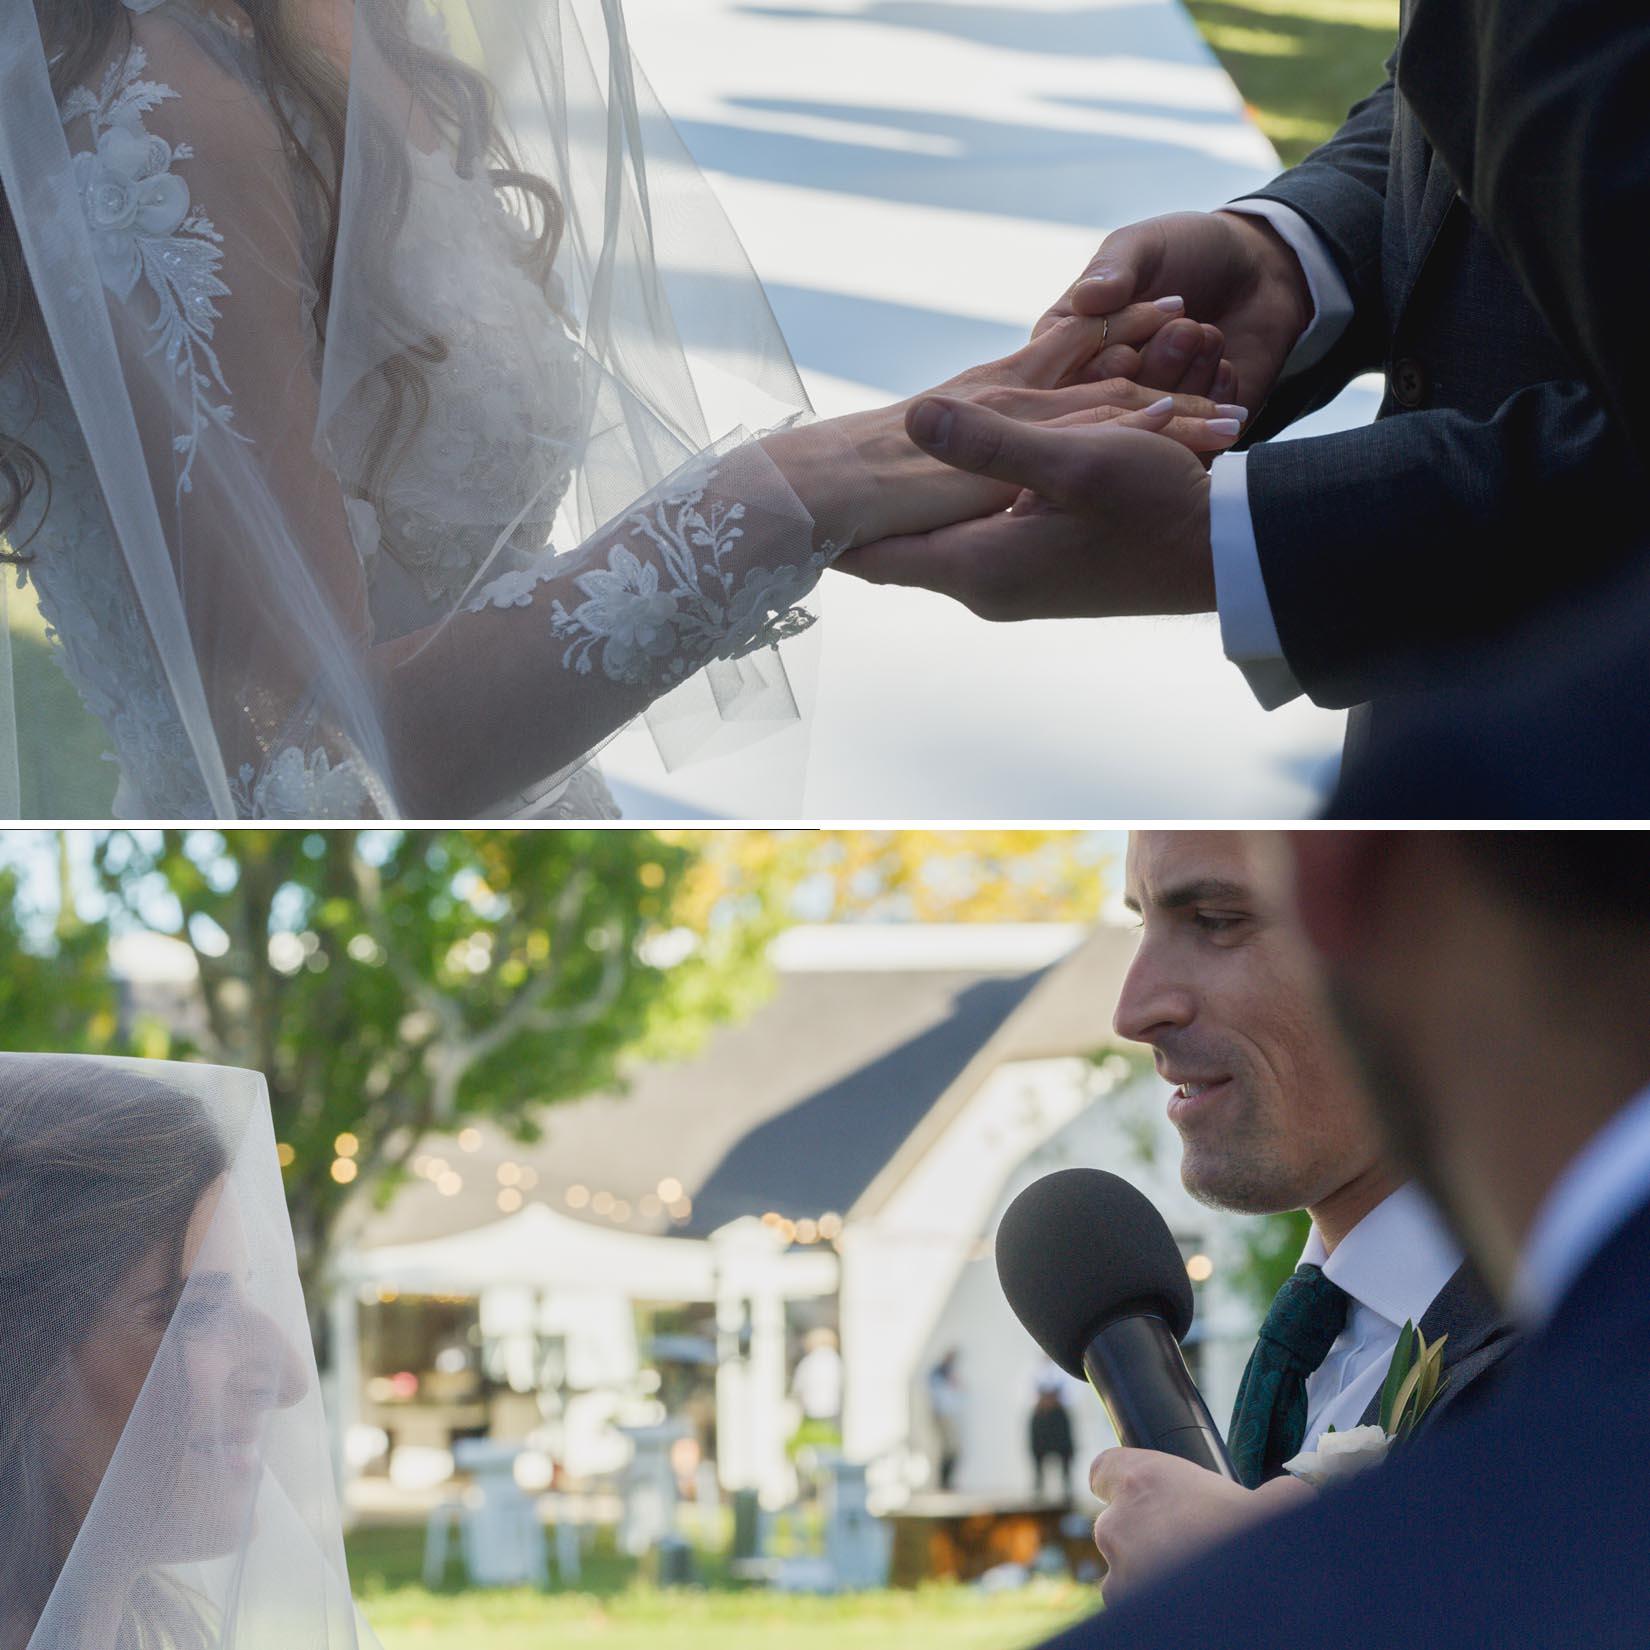 Leon_&_Martine's_Wedding_Photographs_17th_April_2019_@johnhenryweddingphoto_Low_Resolution_Web-277-1.jpg